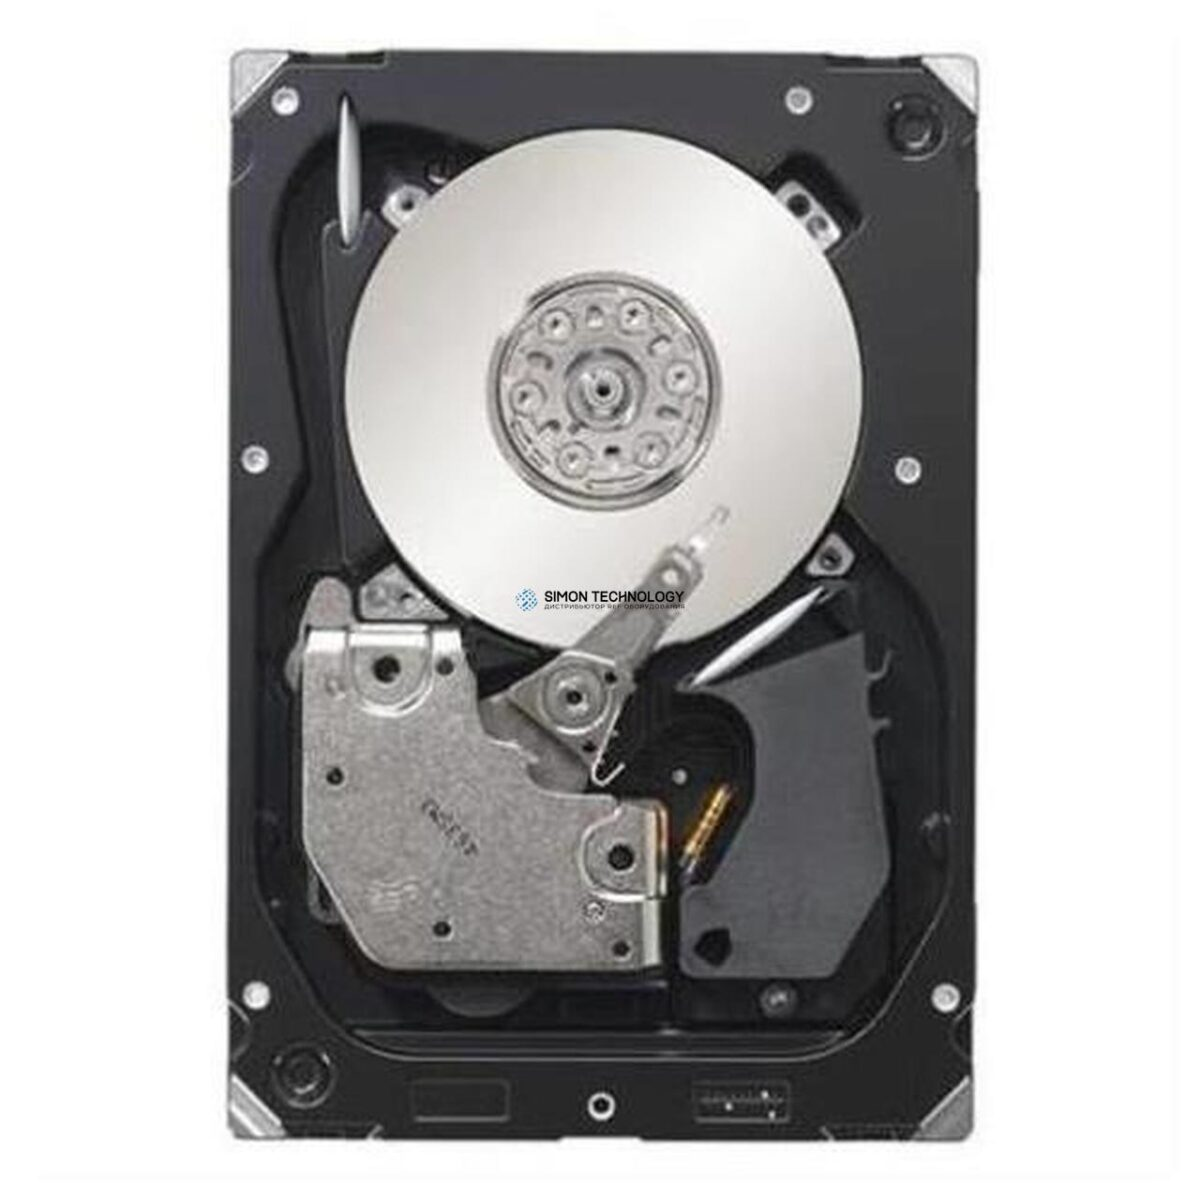 Seagate SAS-Festplatte 4TB 7,2k SAS 6G - (9ZM270-175)